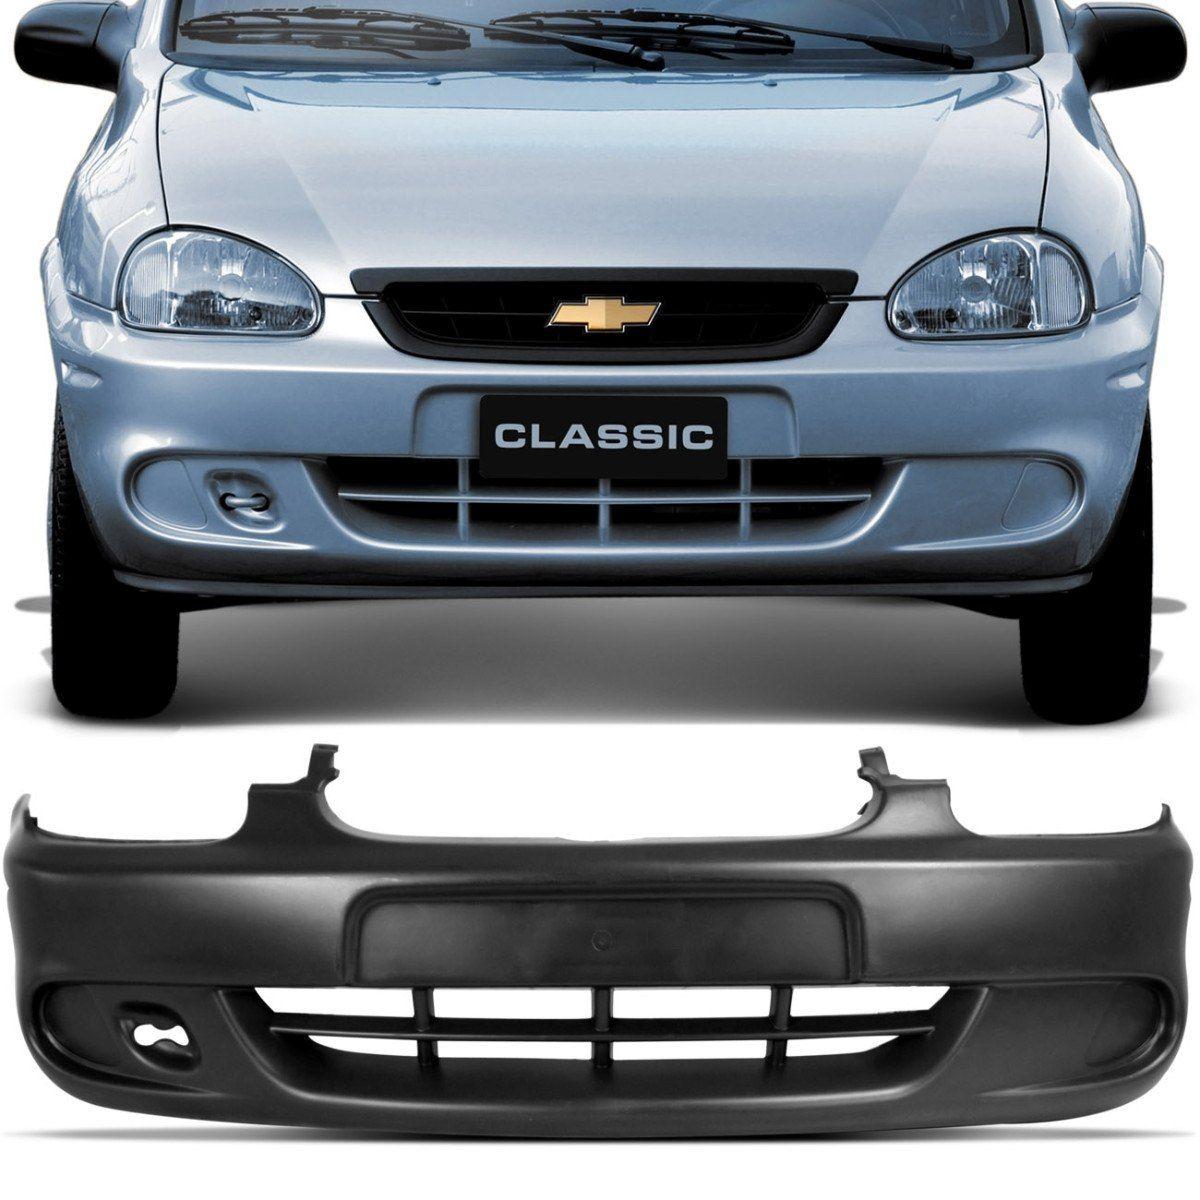 Parachoque Dianteiro Corsa Hatch Sedan Classic Preto Liso Para Pintura 00 a 08